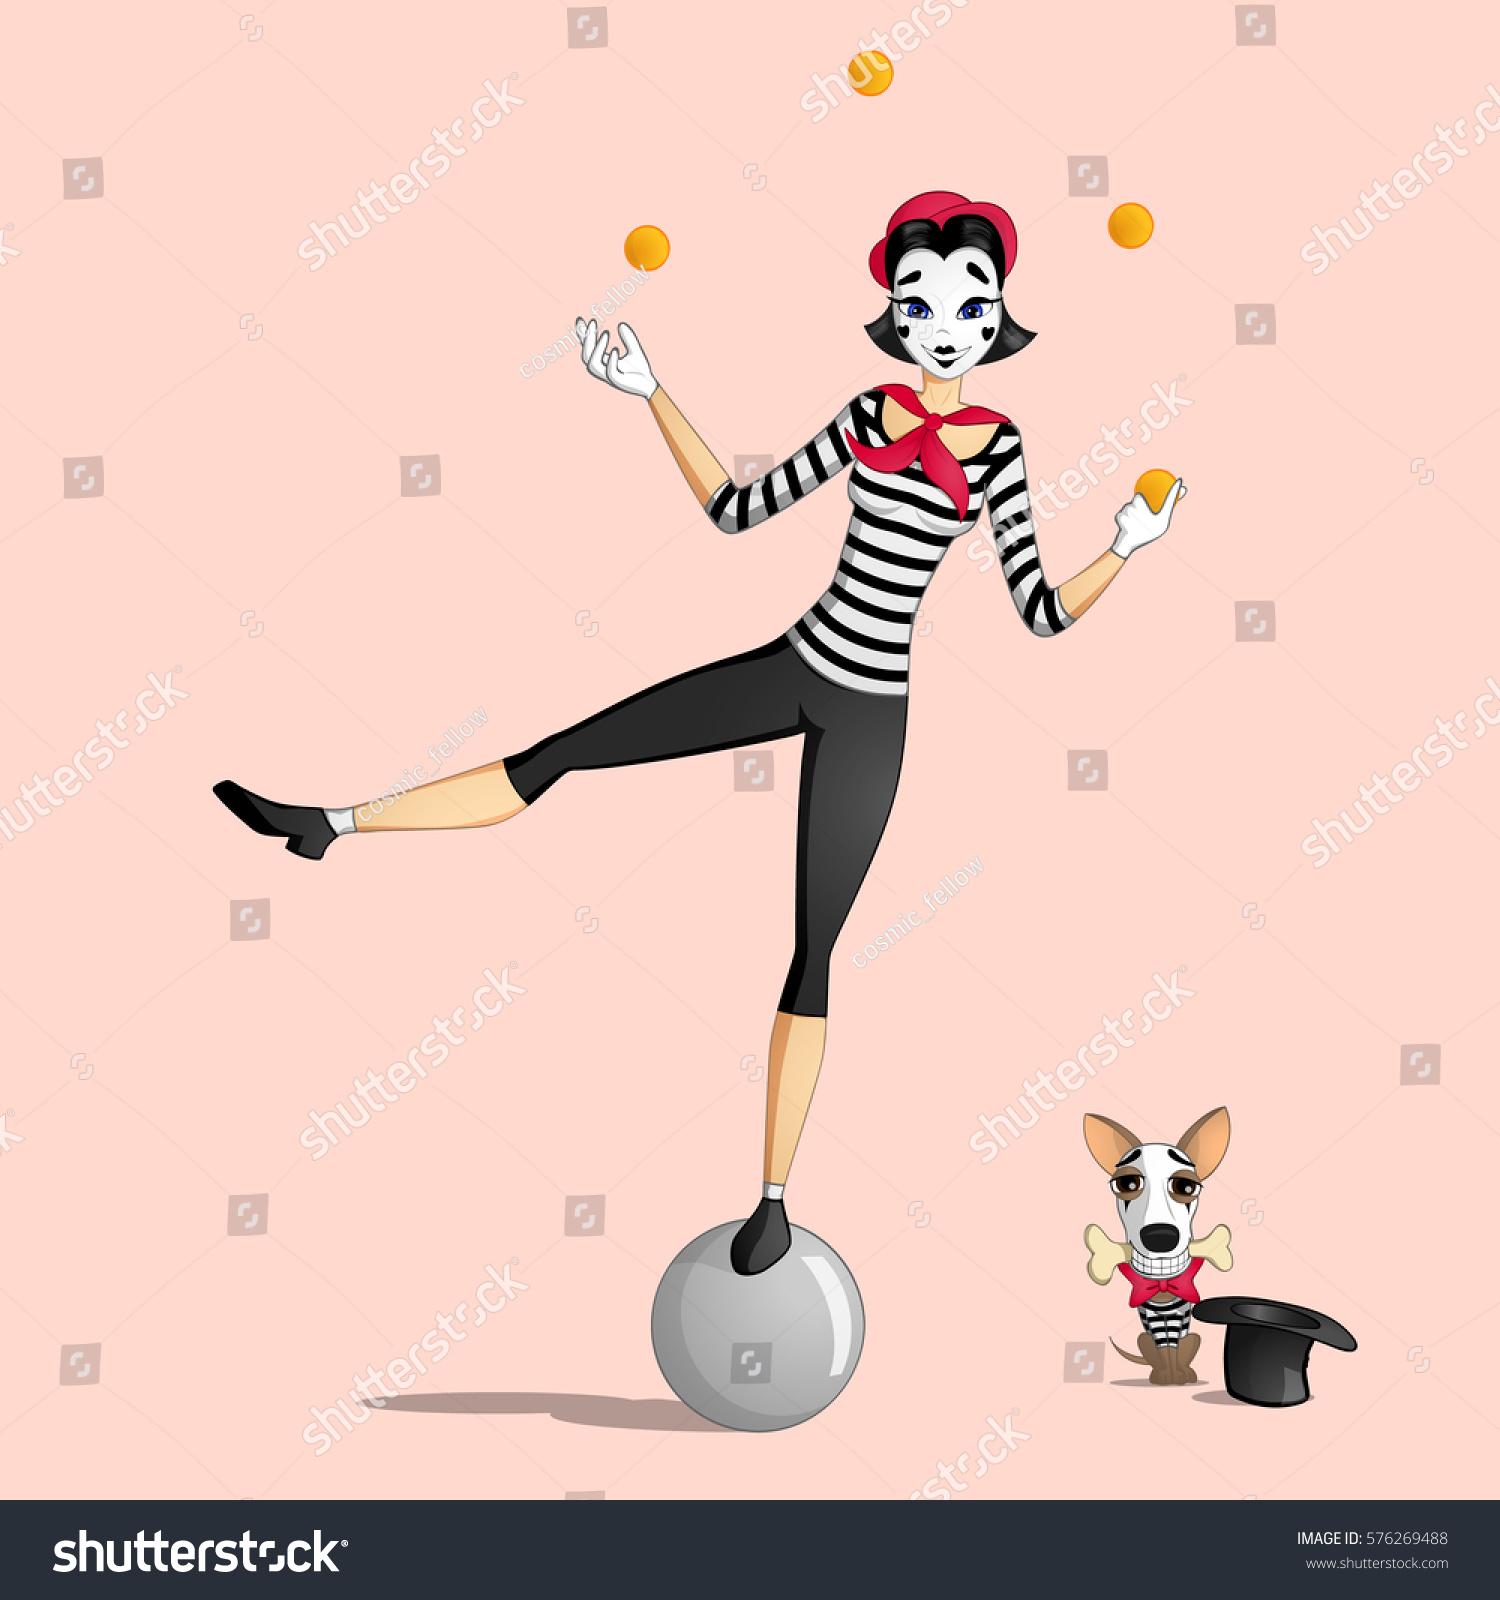 girl mime performing pantomime called juggling のベクター画像素材